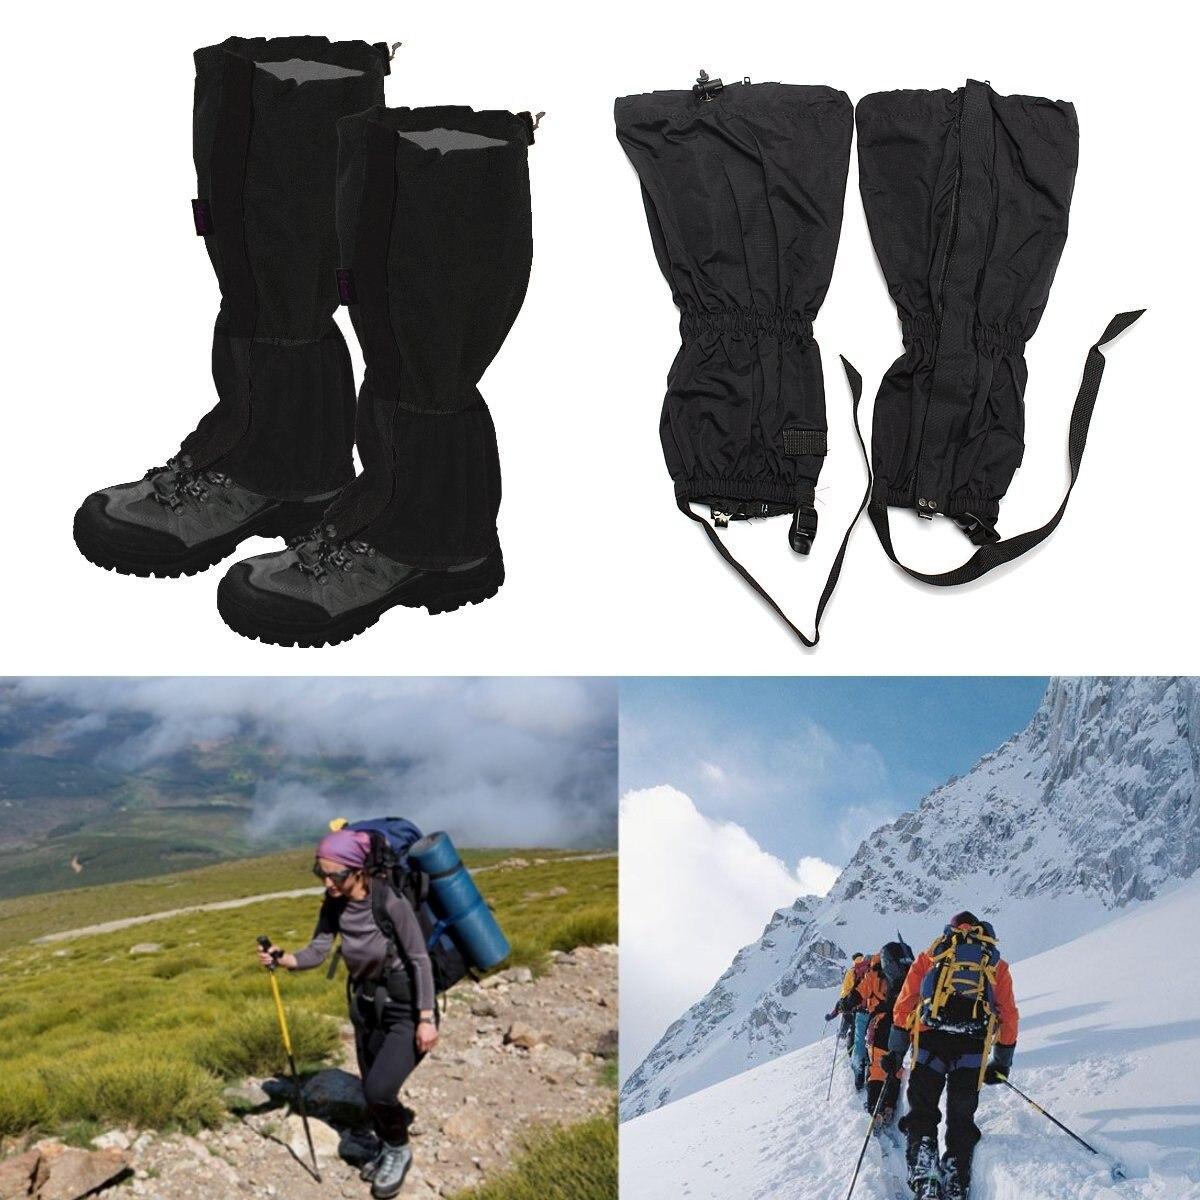 BSAID 1 Pair Snow Gaiters Waterproof Leg Covers Elastic Outdoor Women Men Shoe Boot Legging Wraps Climbing Hiking Ski Shoe Cover недорго, оригинальная цена